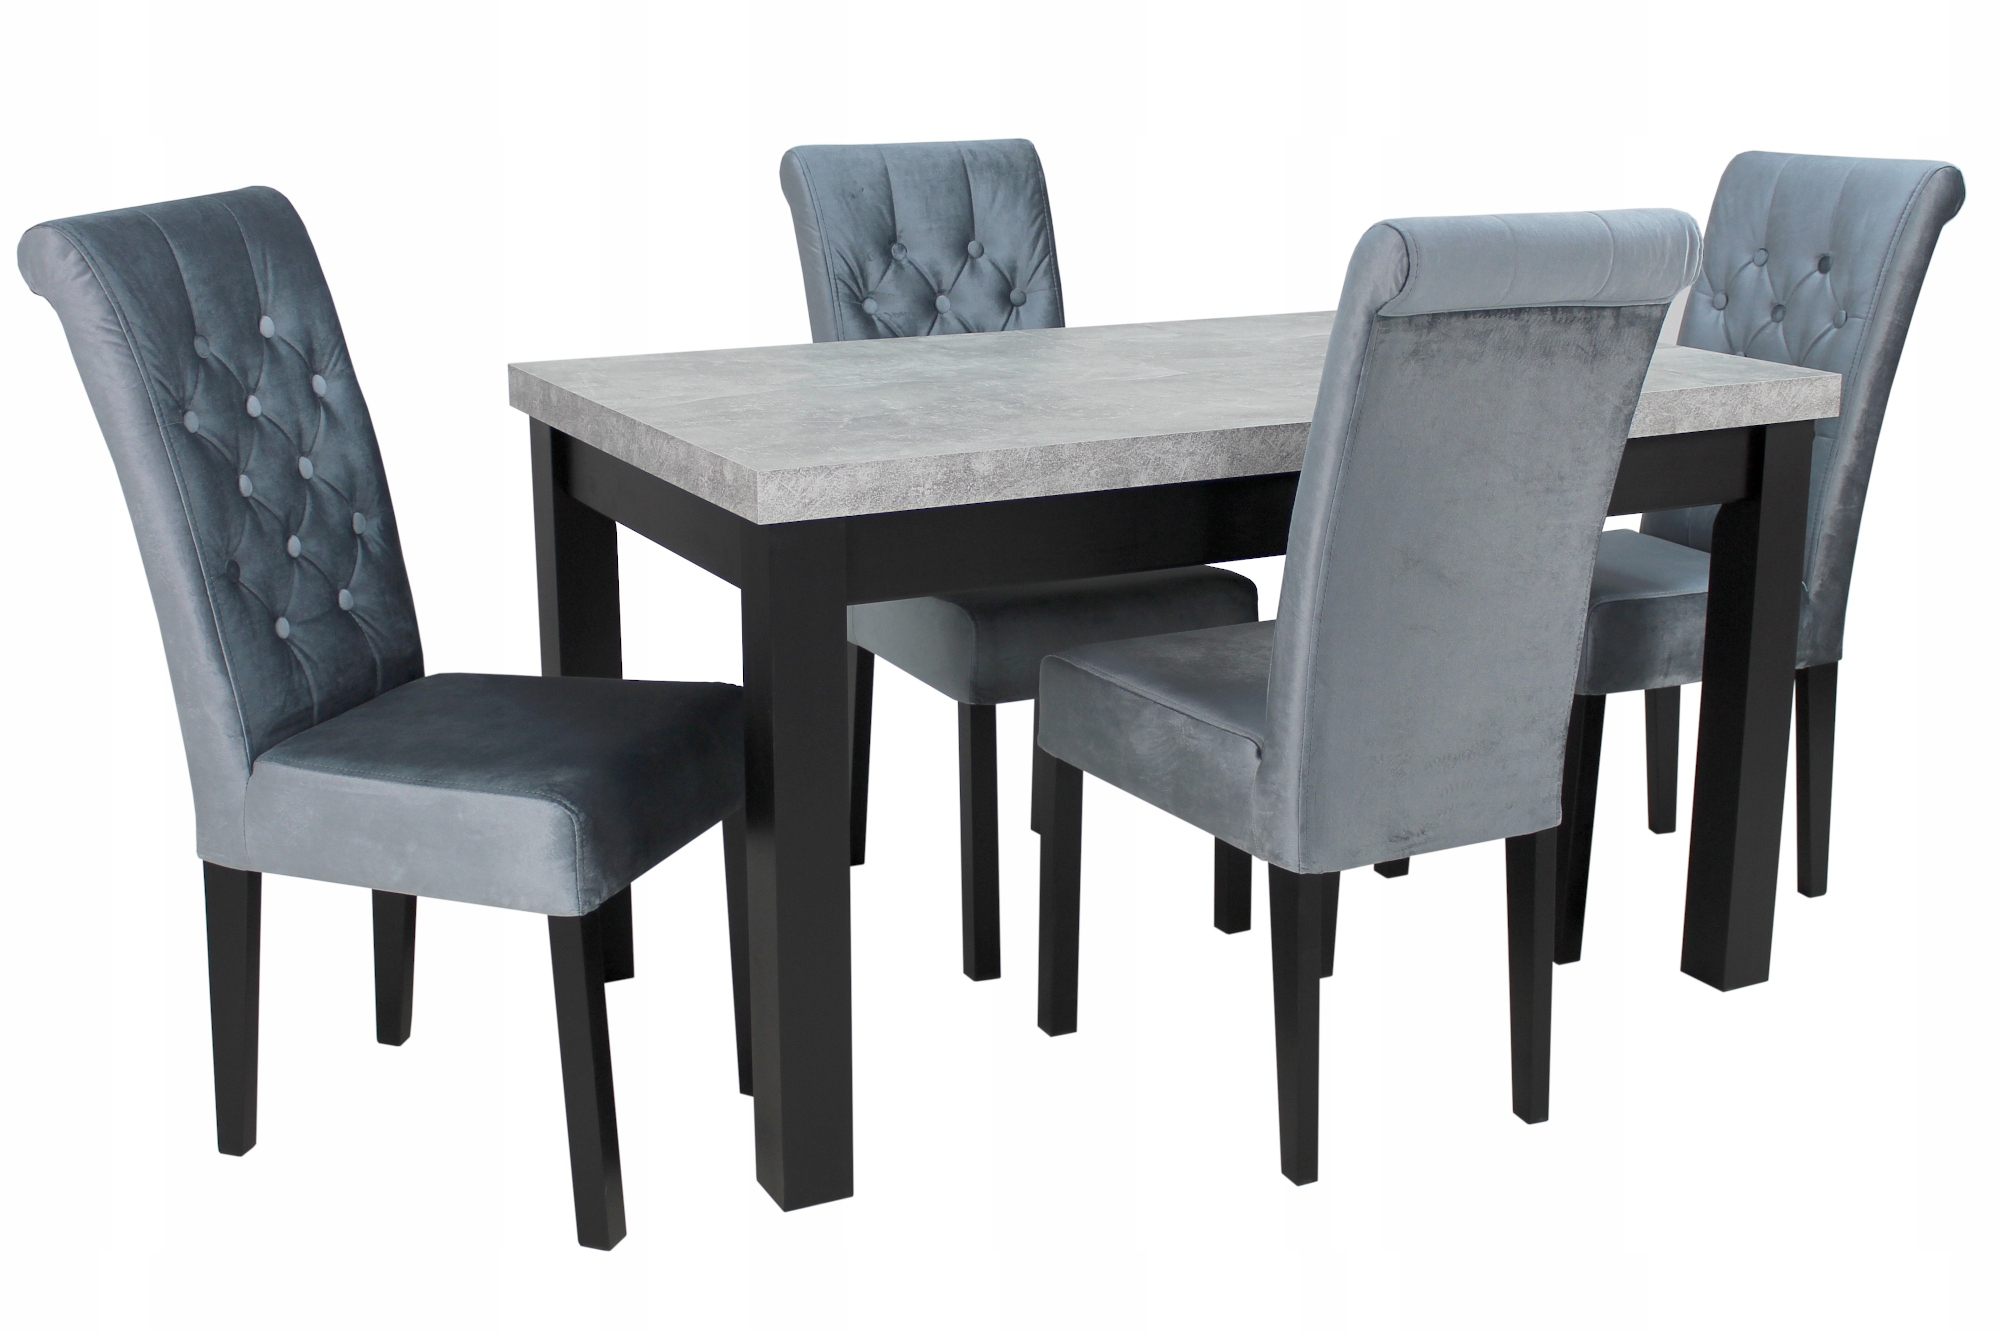 4 стула GLAMOUR + раздвижной стол 80x140 / 180 см